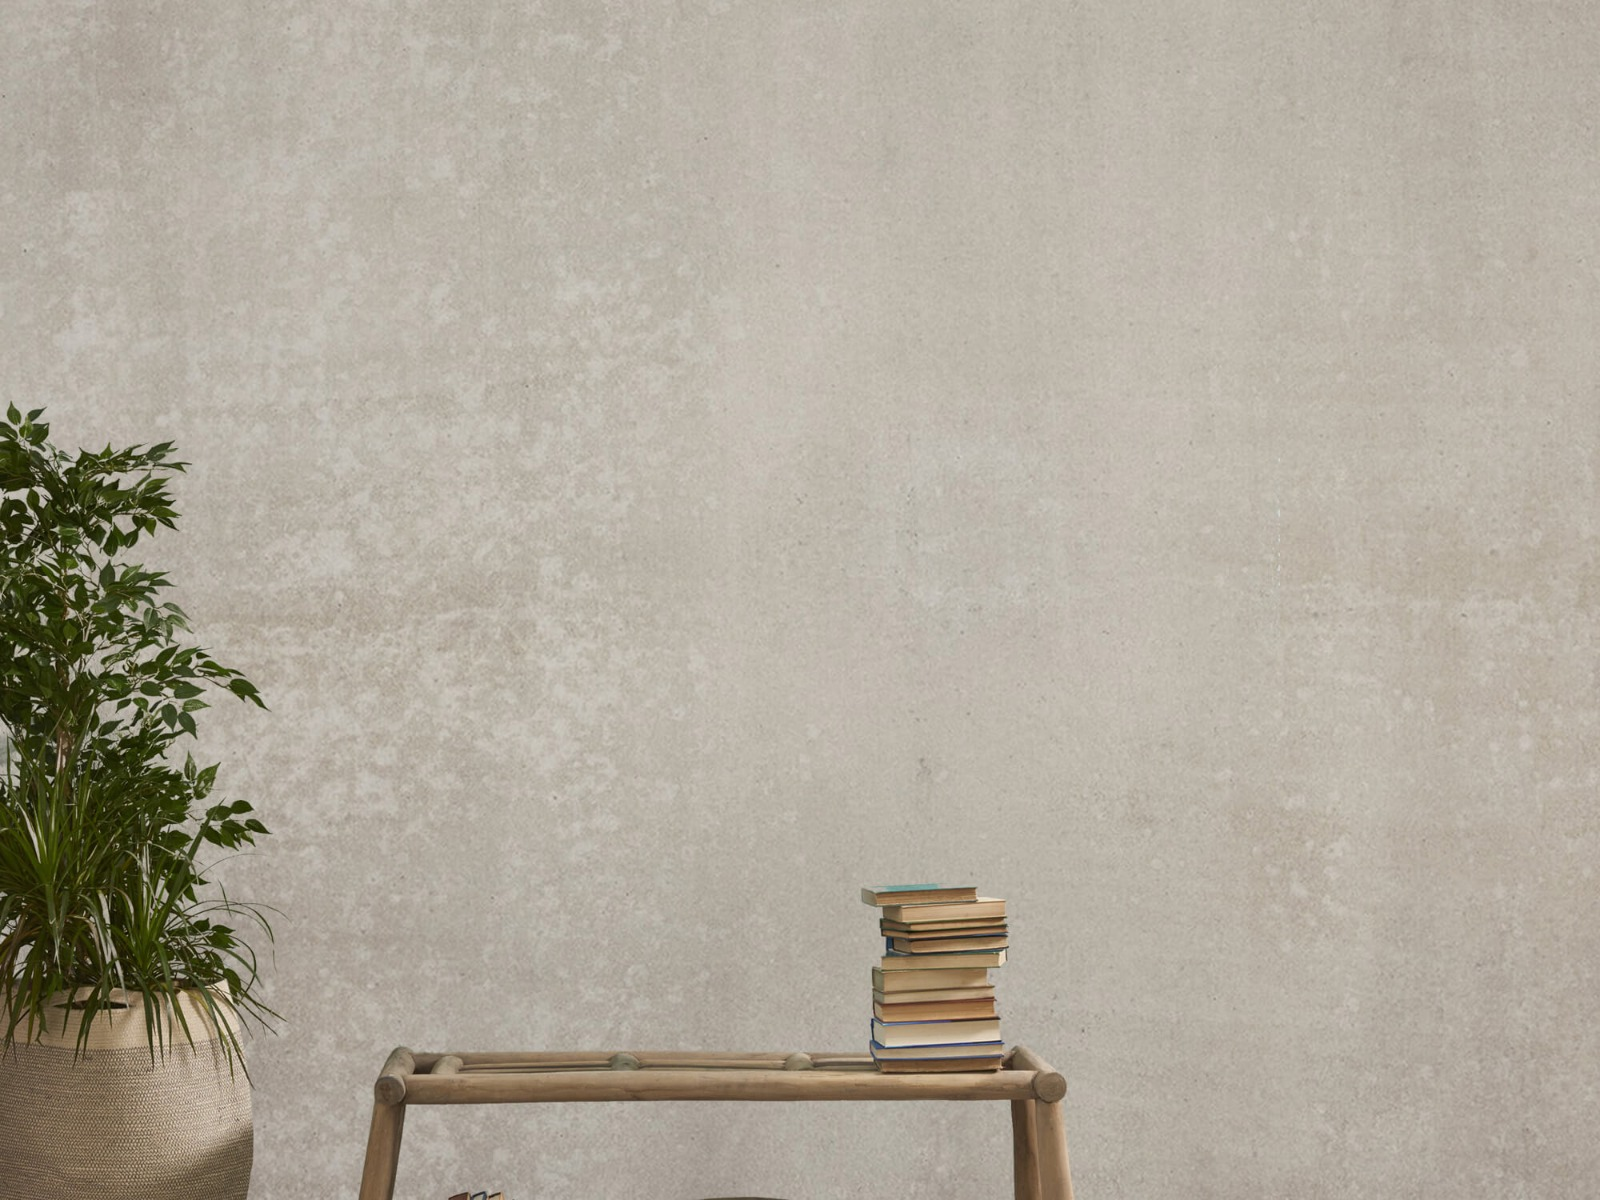 Betonlook behang - Taupe beton - Wallexclusive - Woonkamer 20